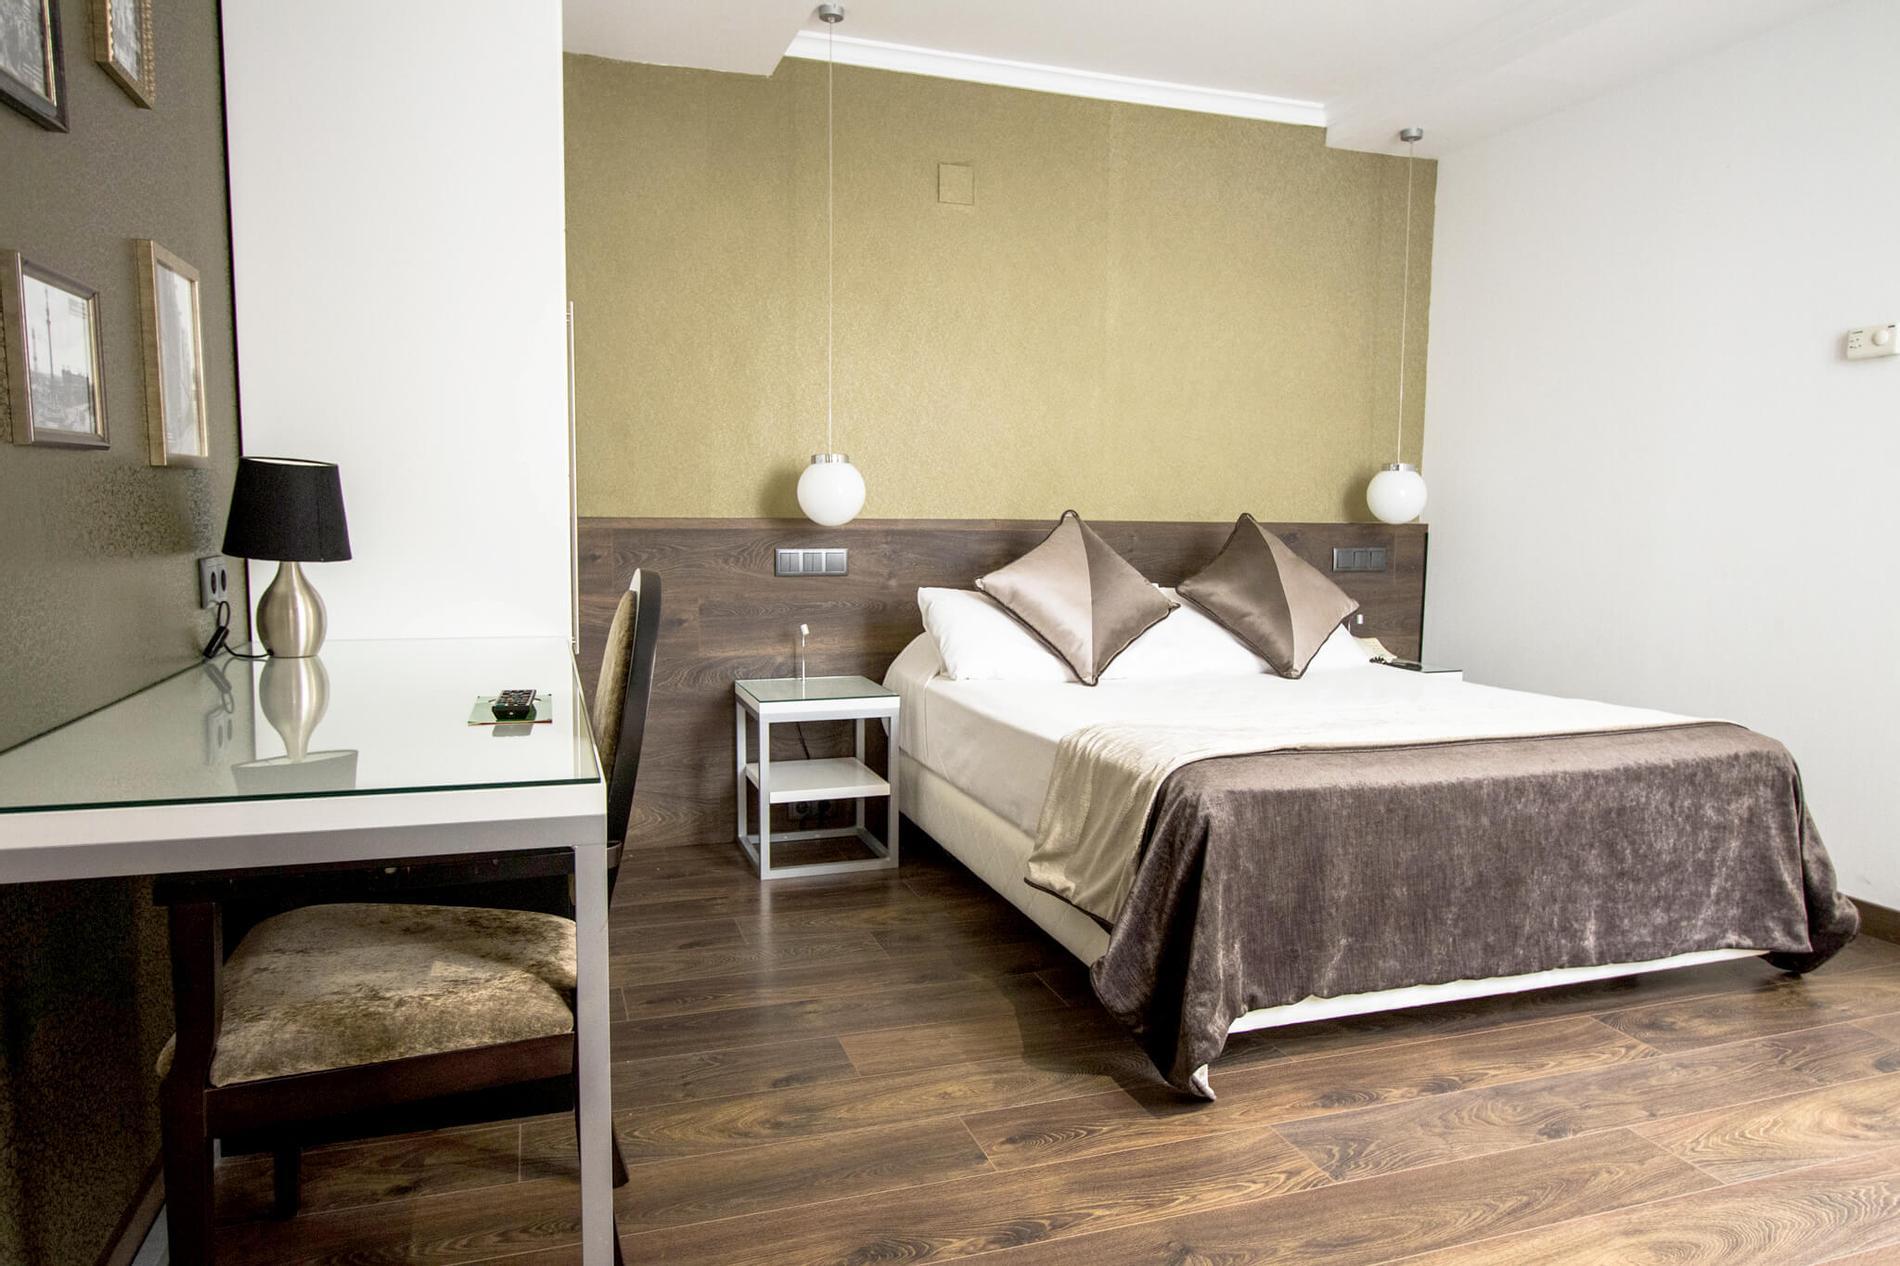 Hotel moderno bcn p gina web oficial for Hotel moderno barcelona